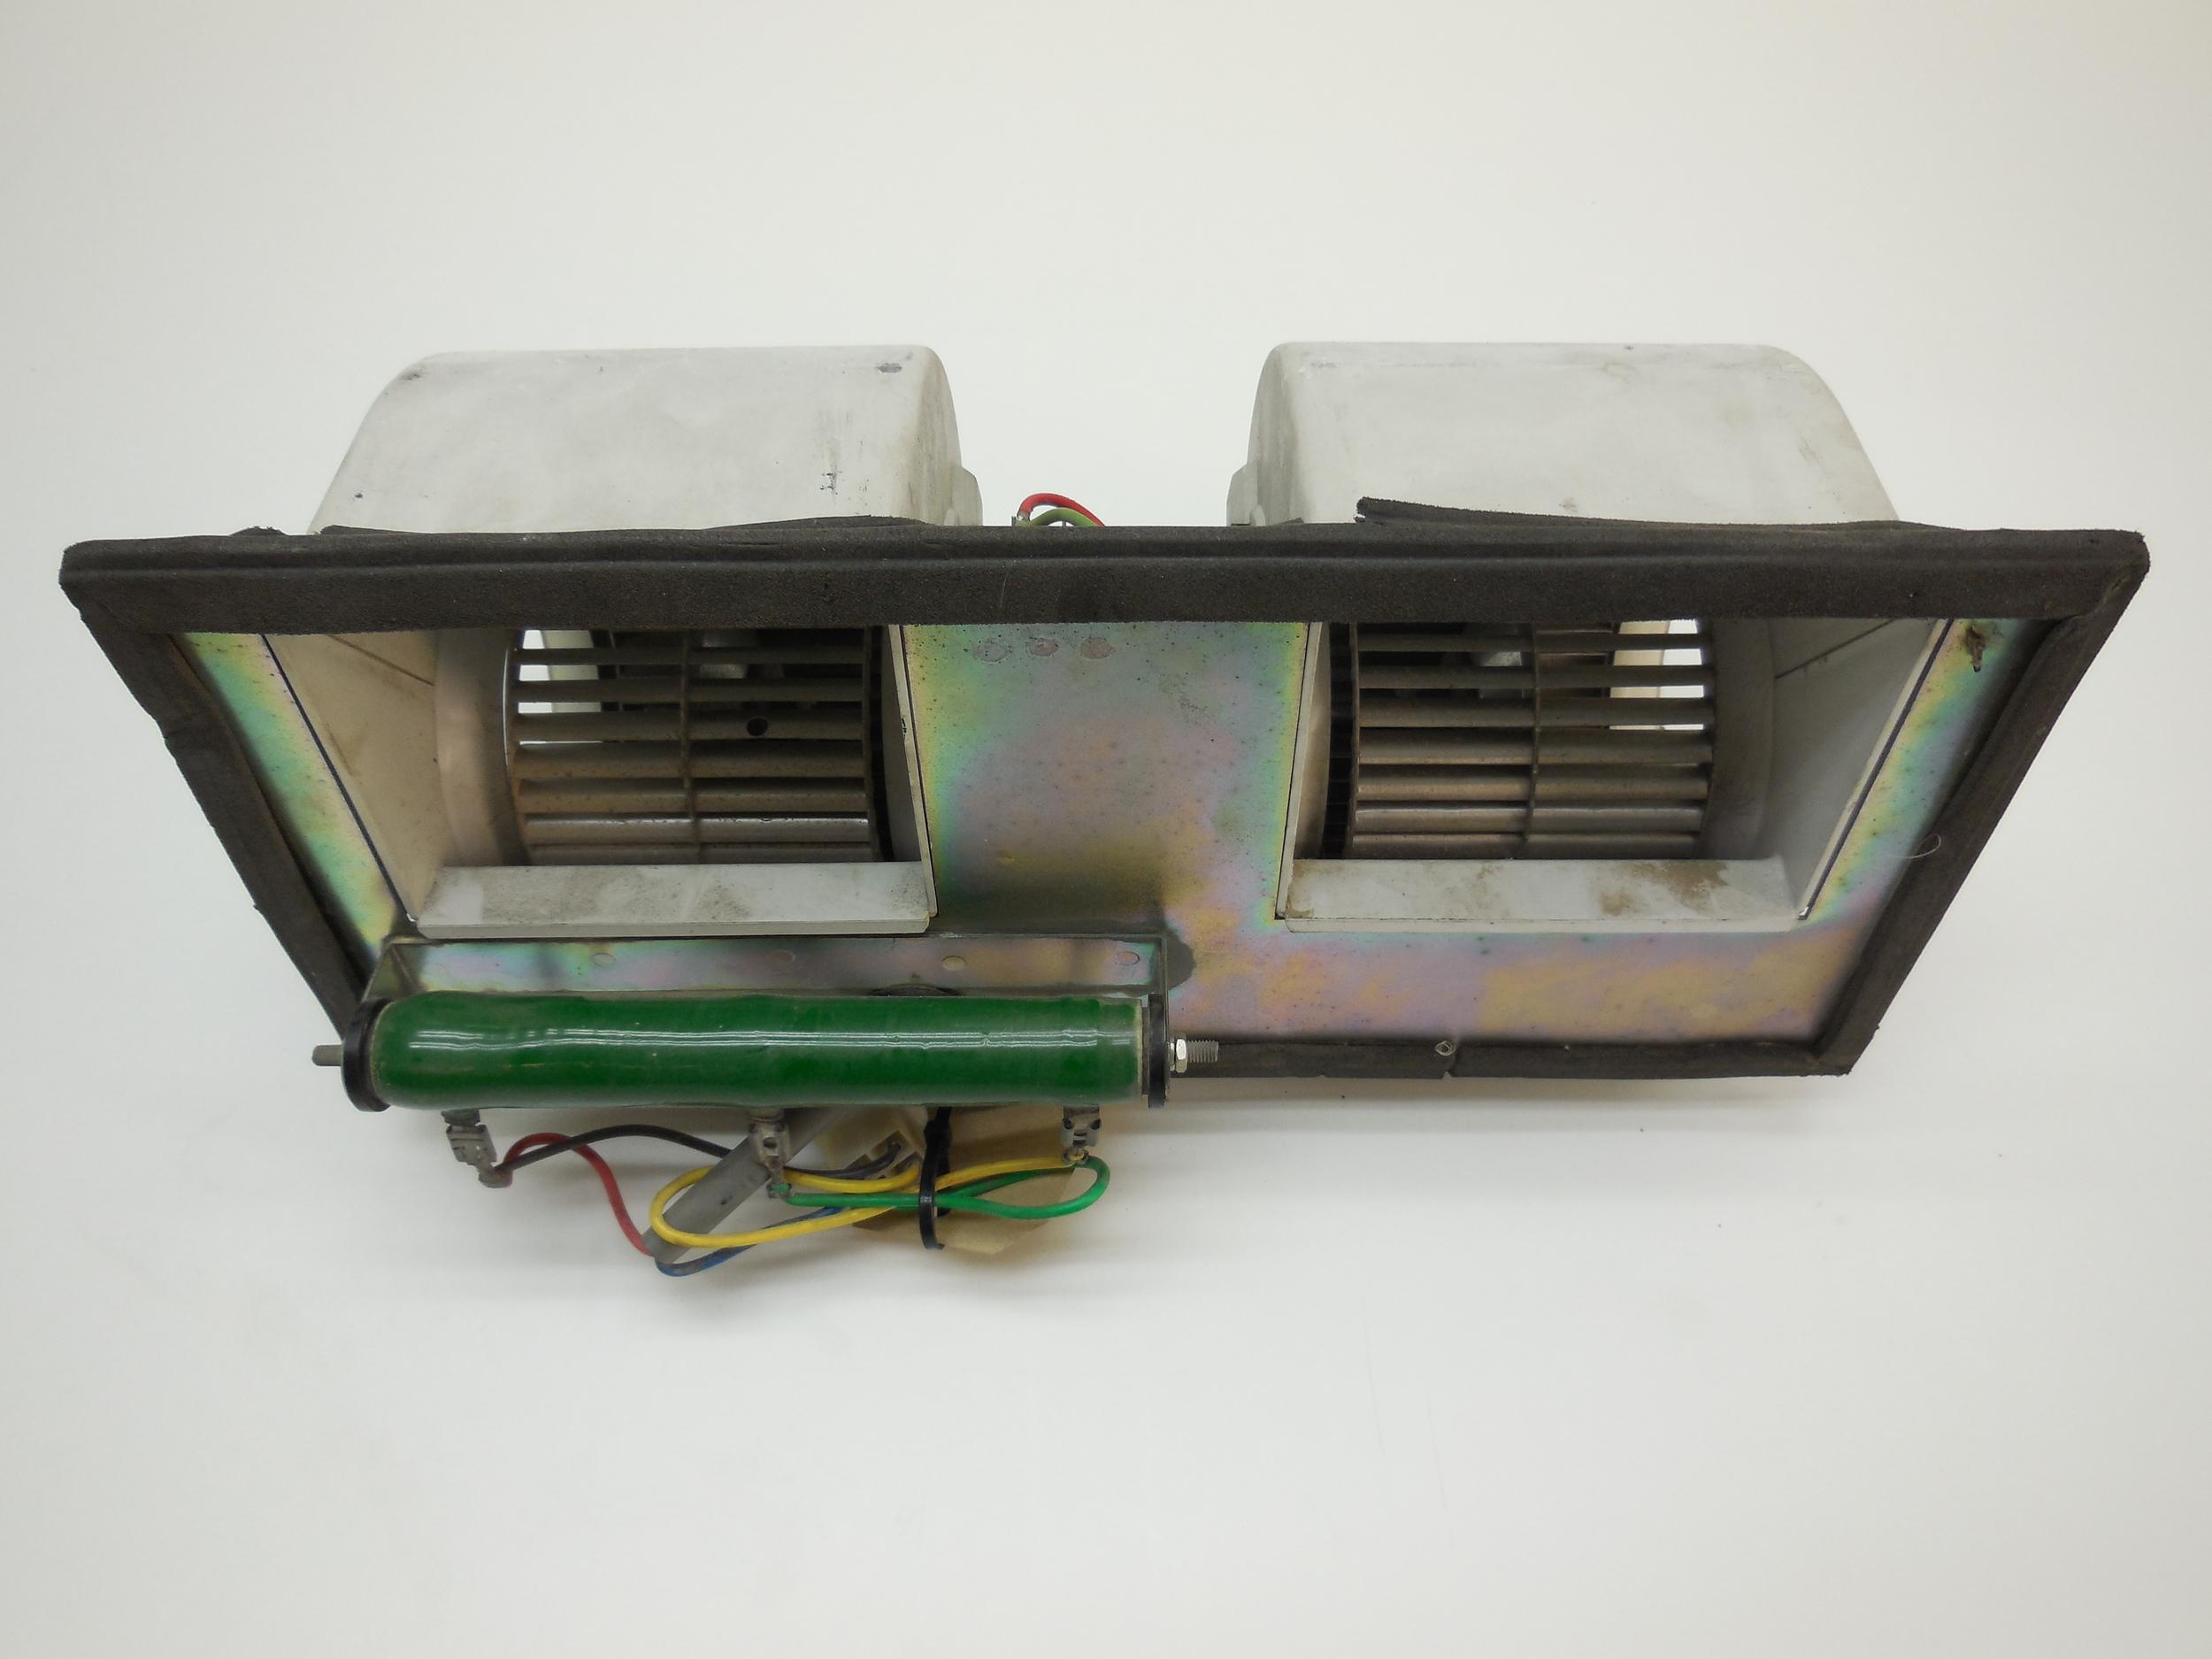 heater fan (used) new motor häggo Nr: 153 6150-647 blast Nr: 100 401 083 price: 8300 sek